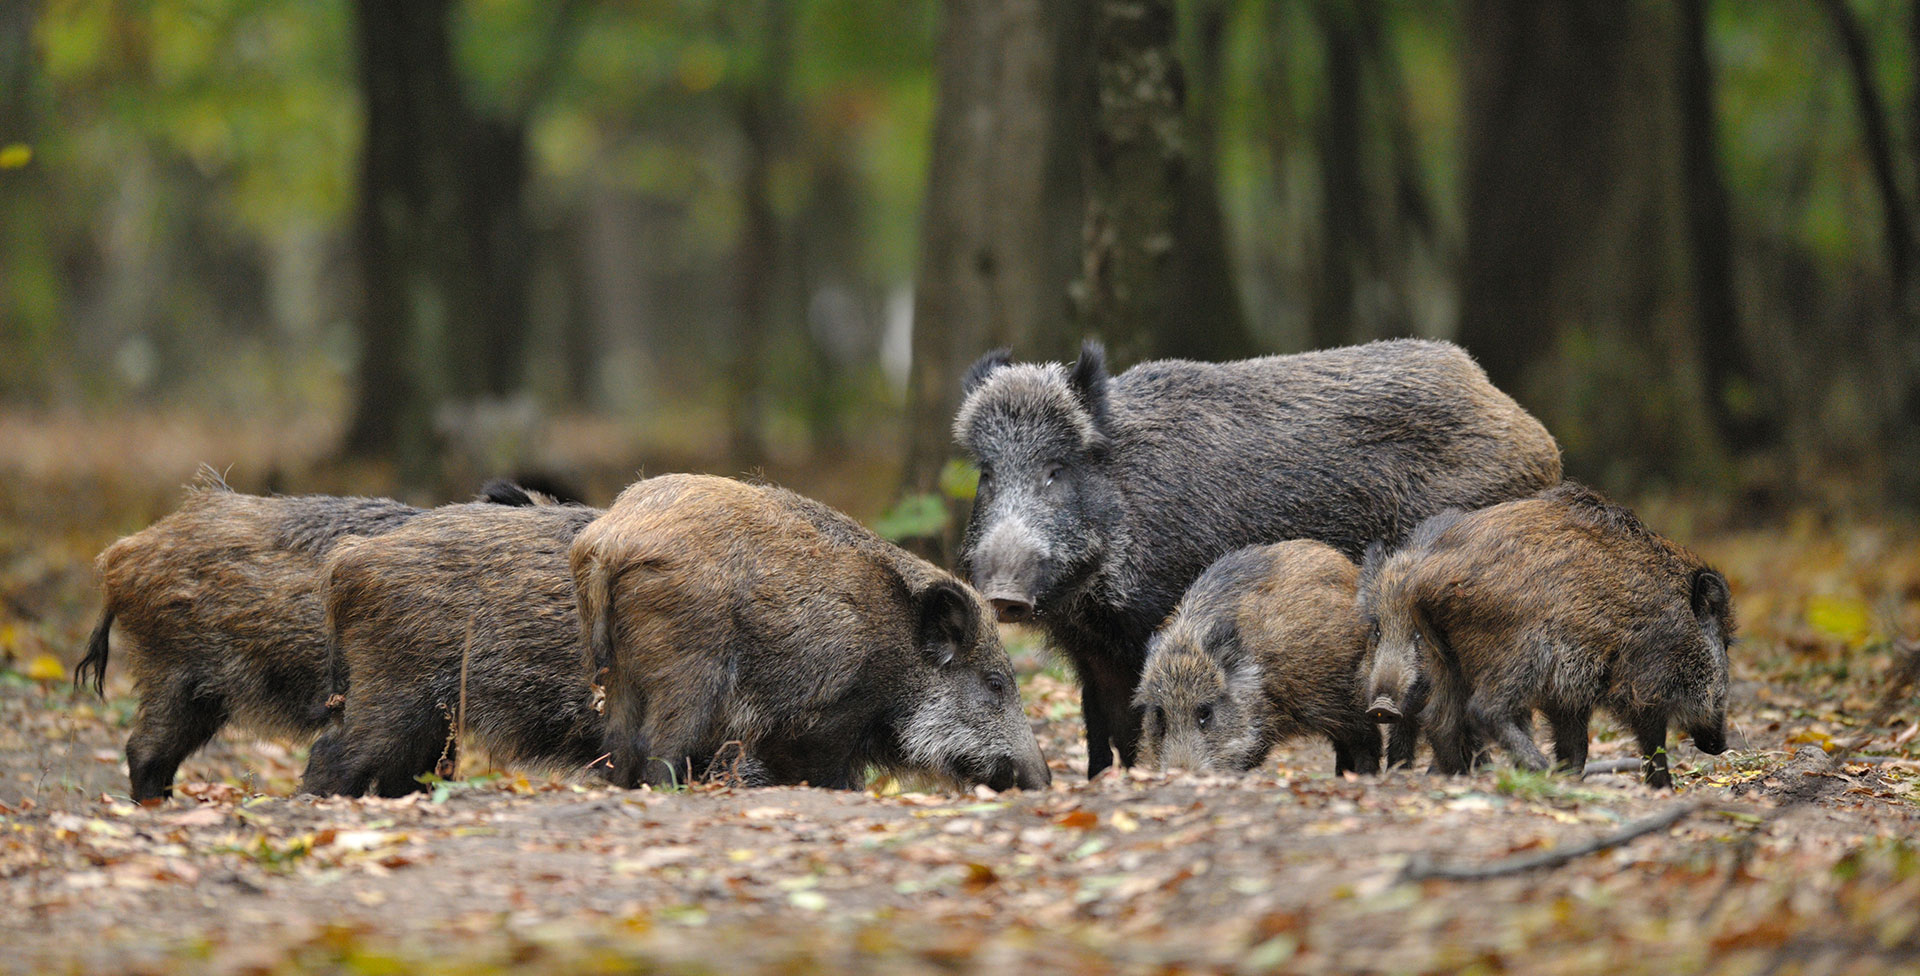 wildoekologie-artenschutz-naturbildung